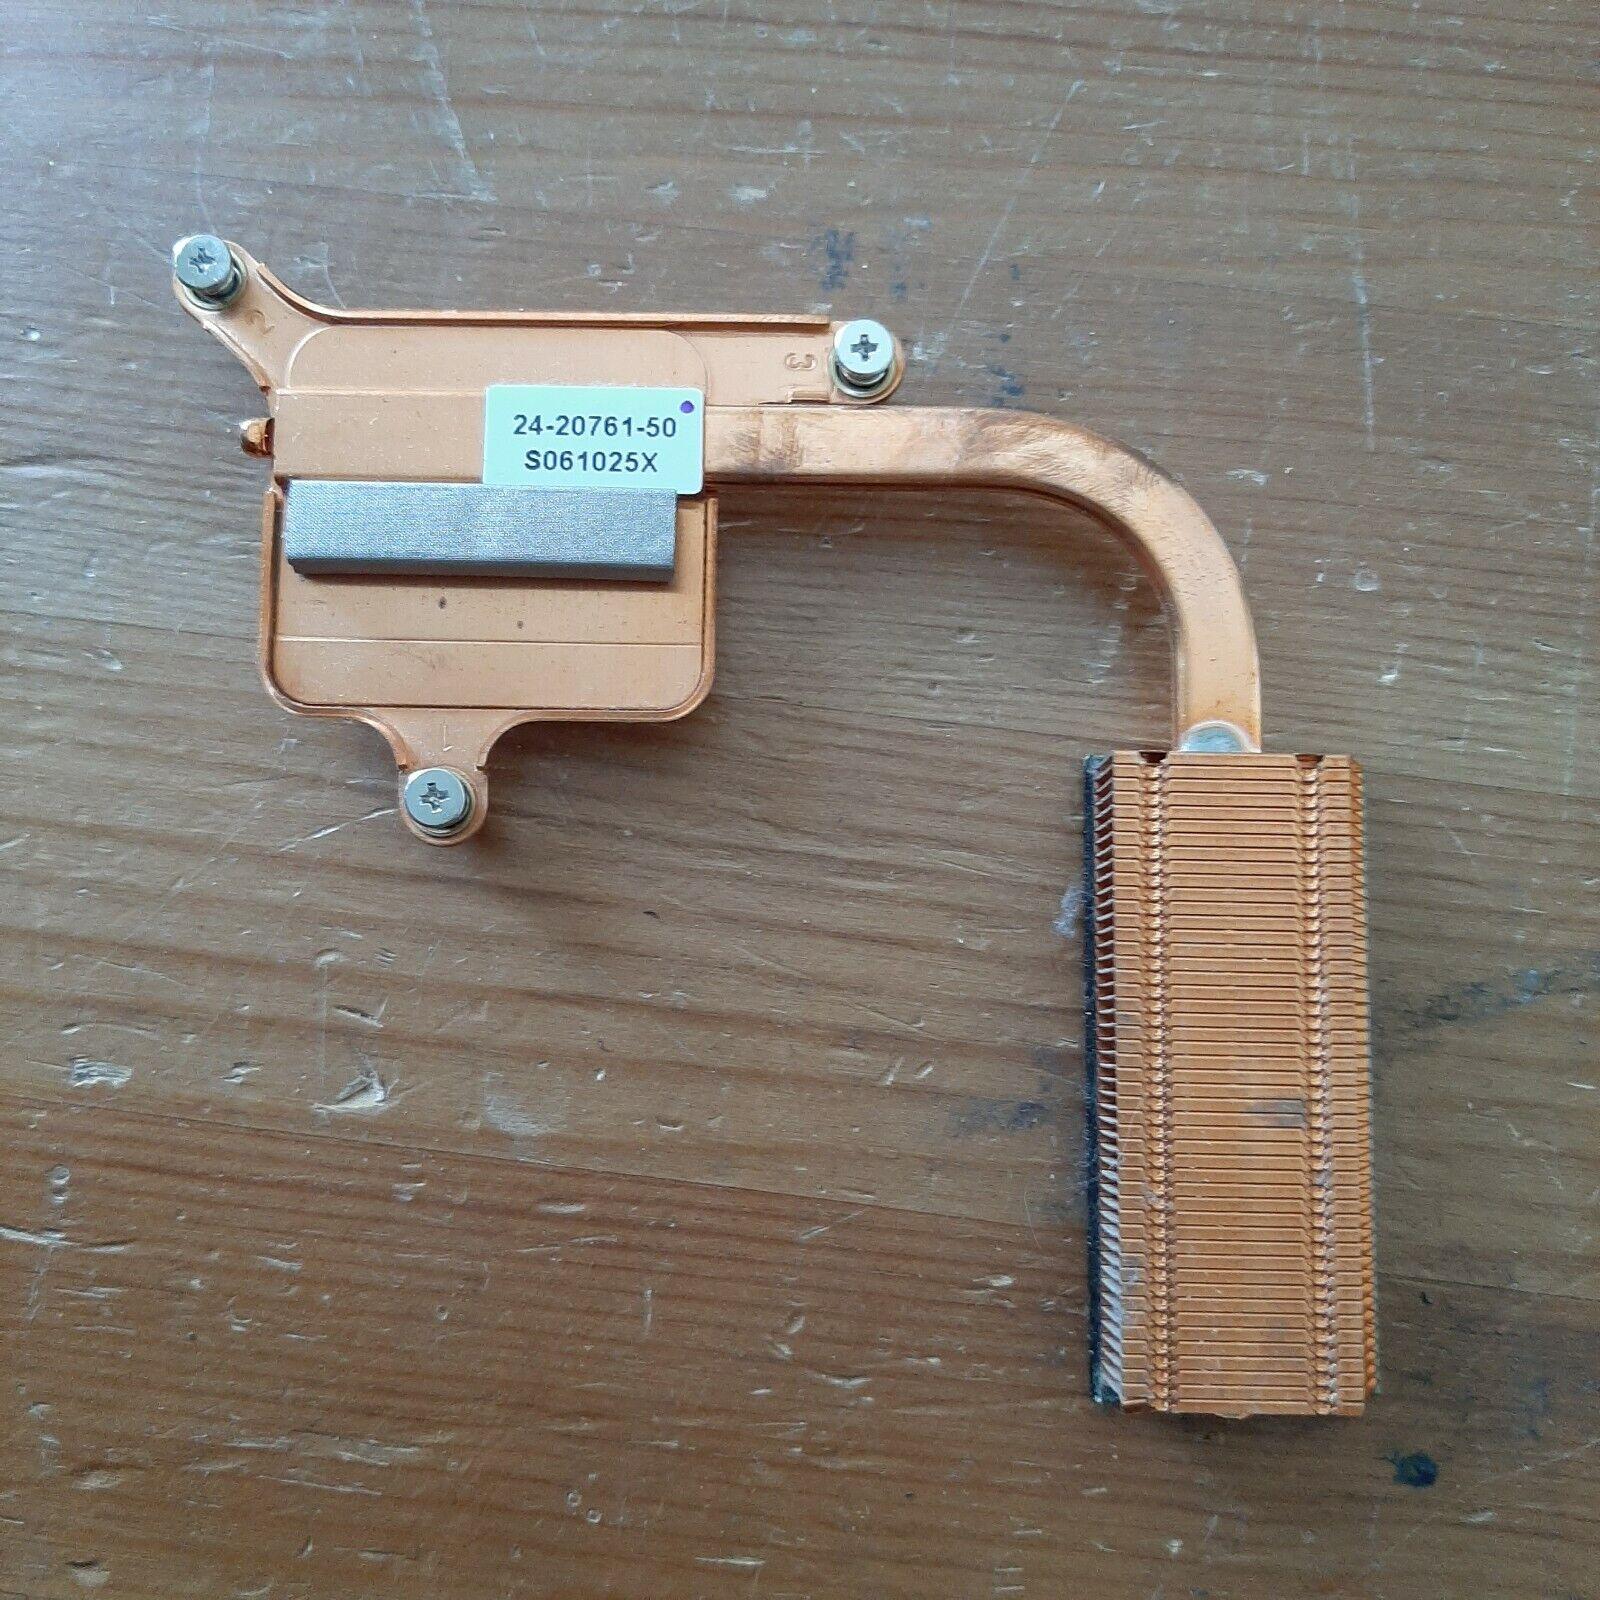 Original sink s061025x for fujitsu siemens amilo l bs 016 (103)